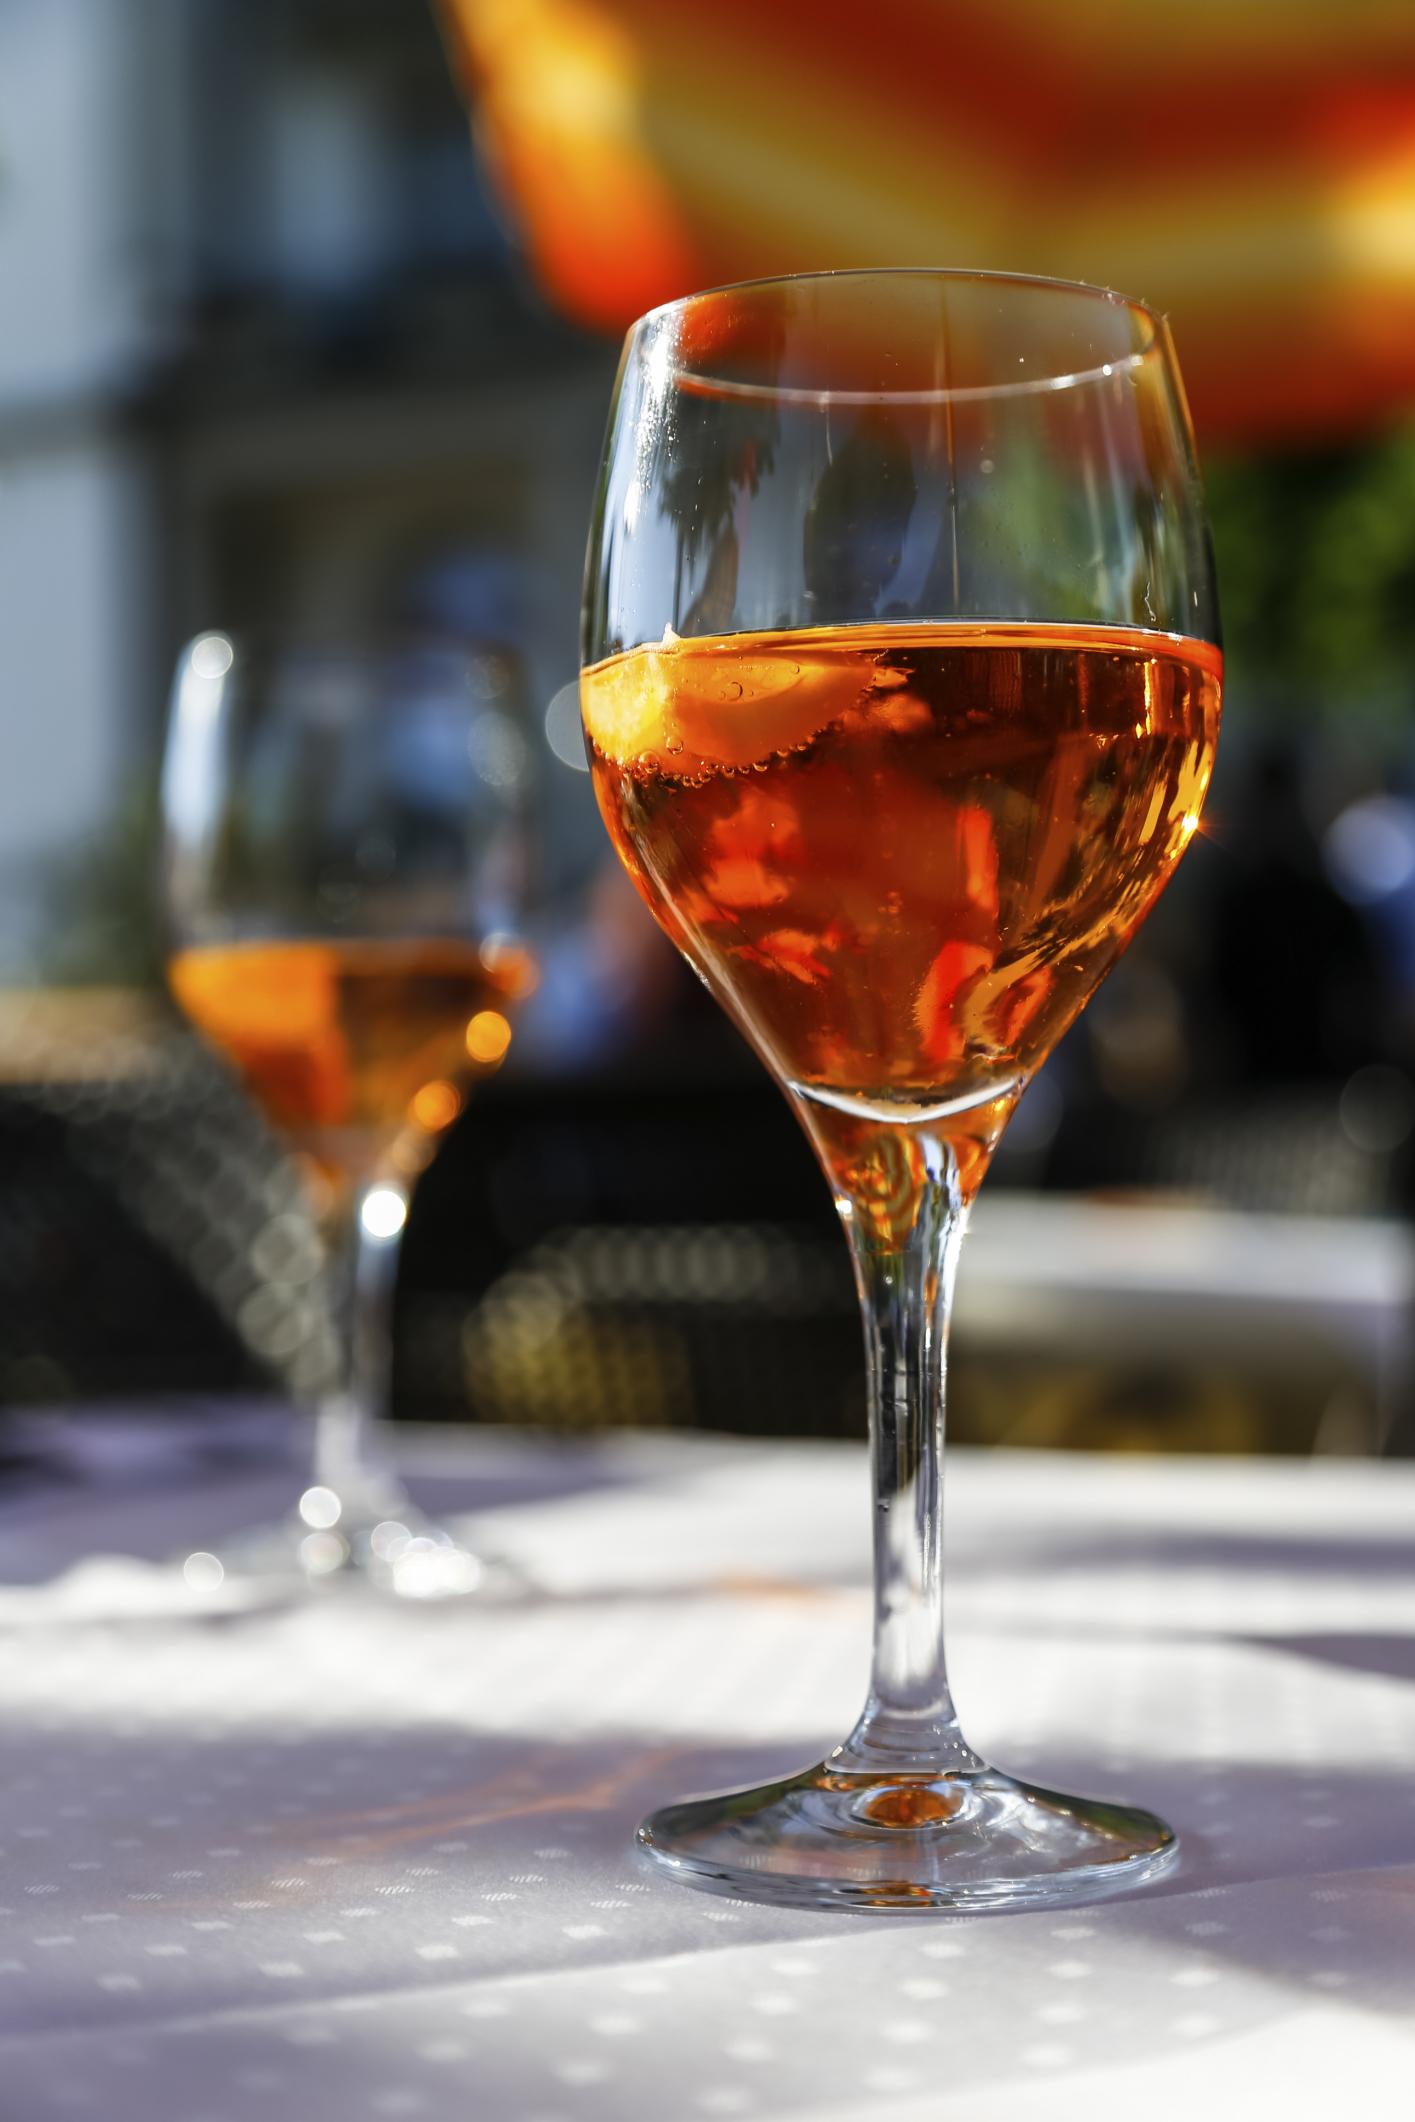 How to Make Raisin Wine | LEAFtv